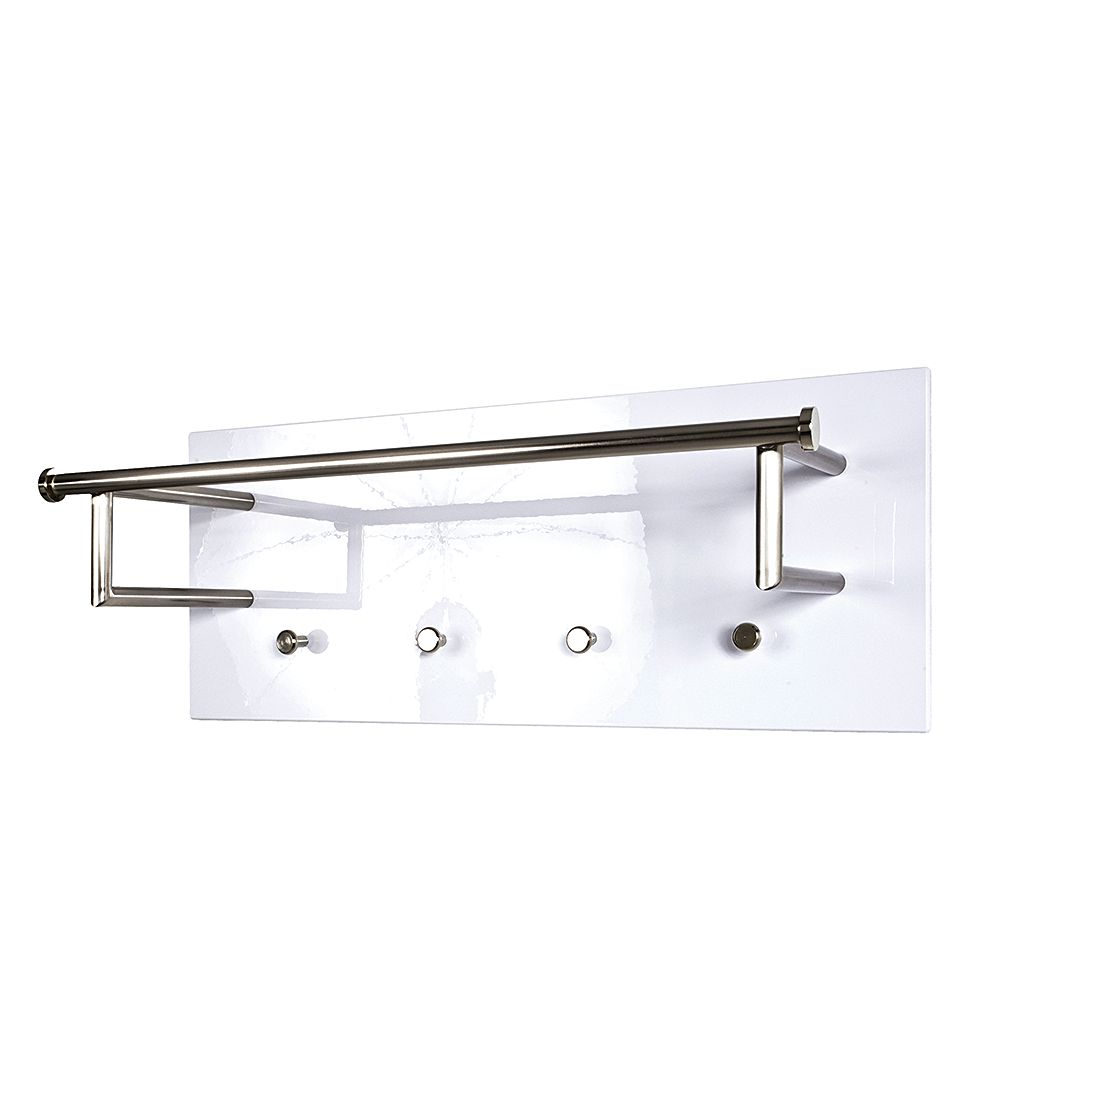 Wandgarderobe Felipe I - roestvrij staal/hoogglans wit, Home Design